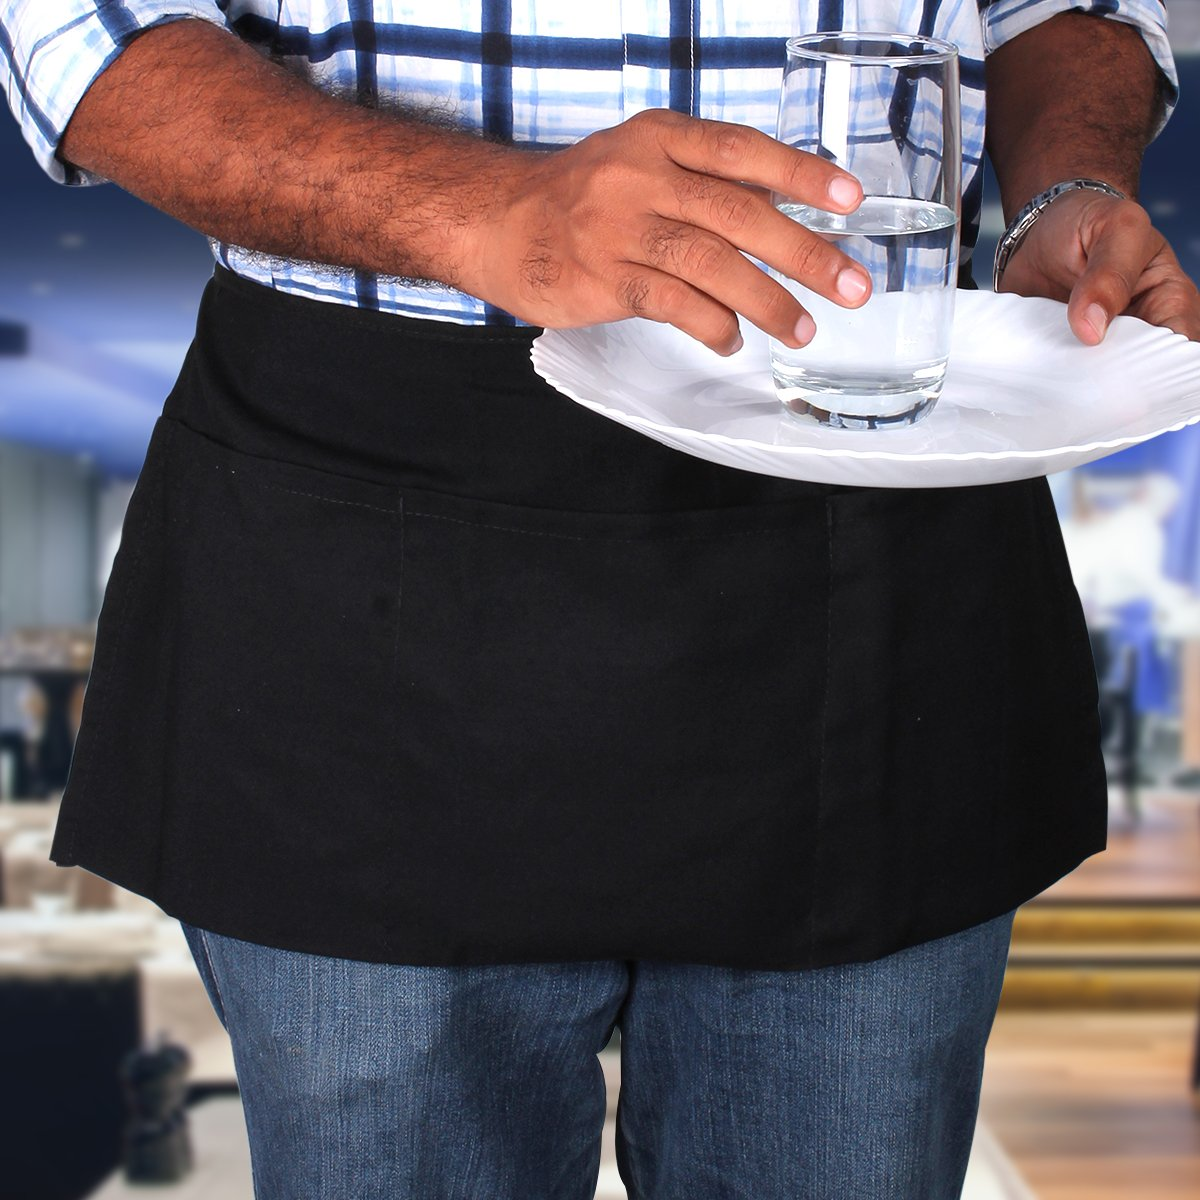 White half apron ebay - Restaurant Check Holder Bartender Half Aprons 3 Waist